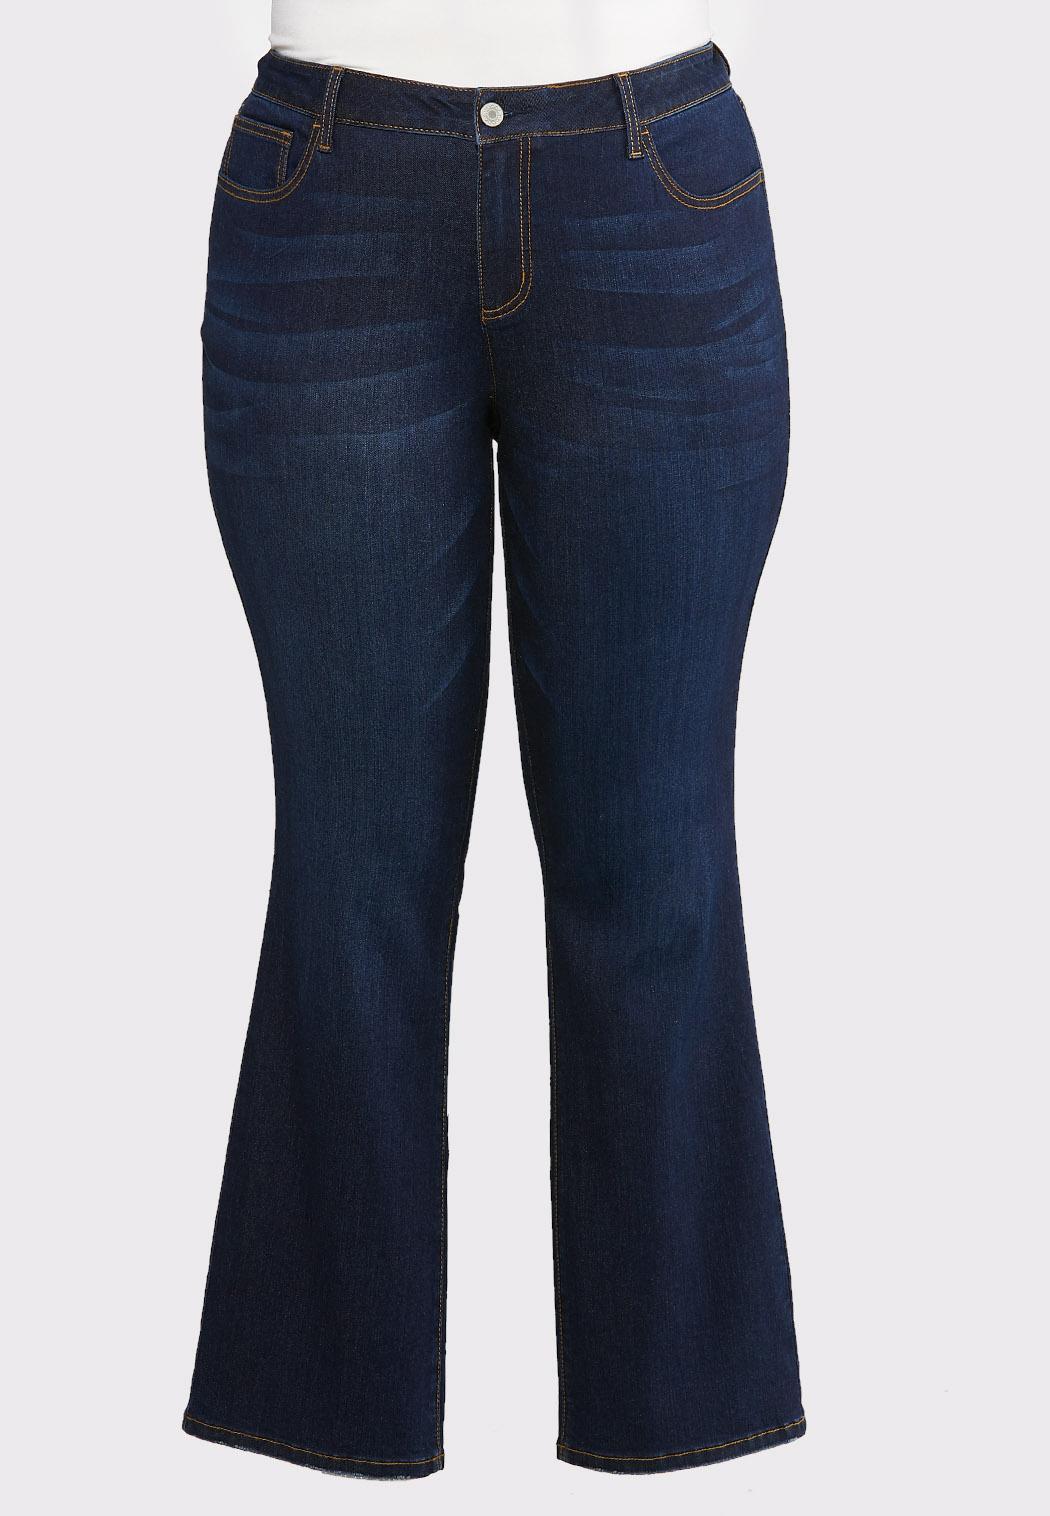 Plus Size Dark Wash Bootcut Jeans